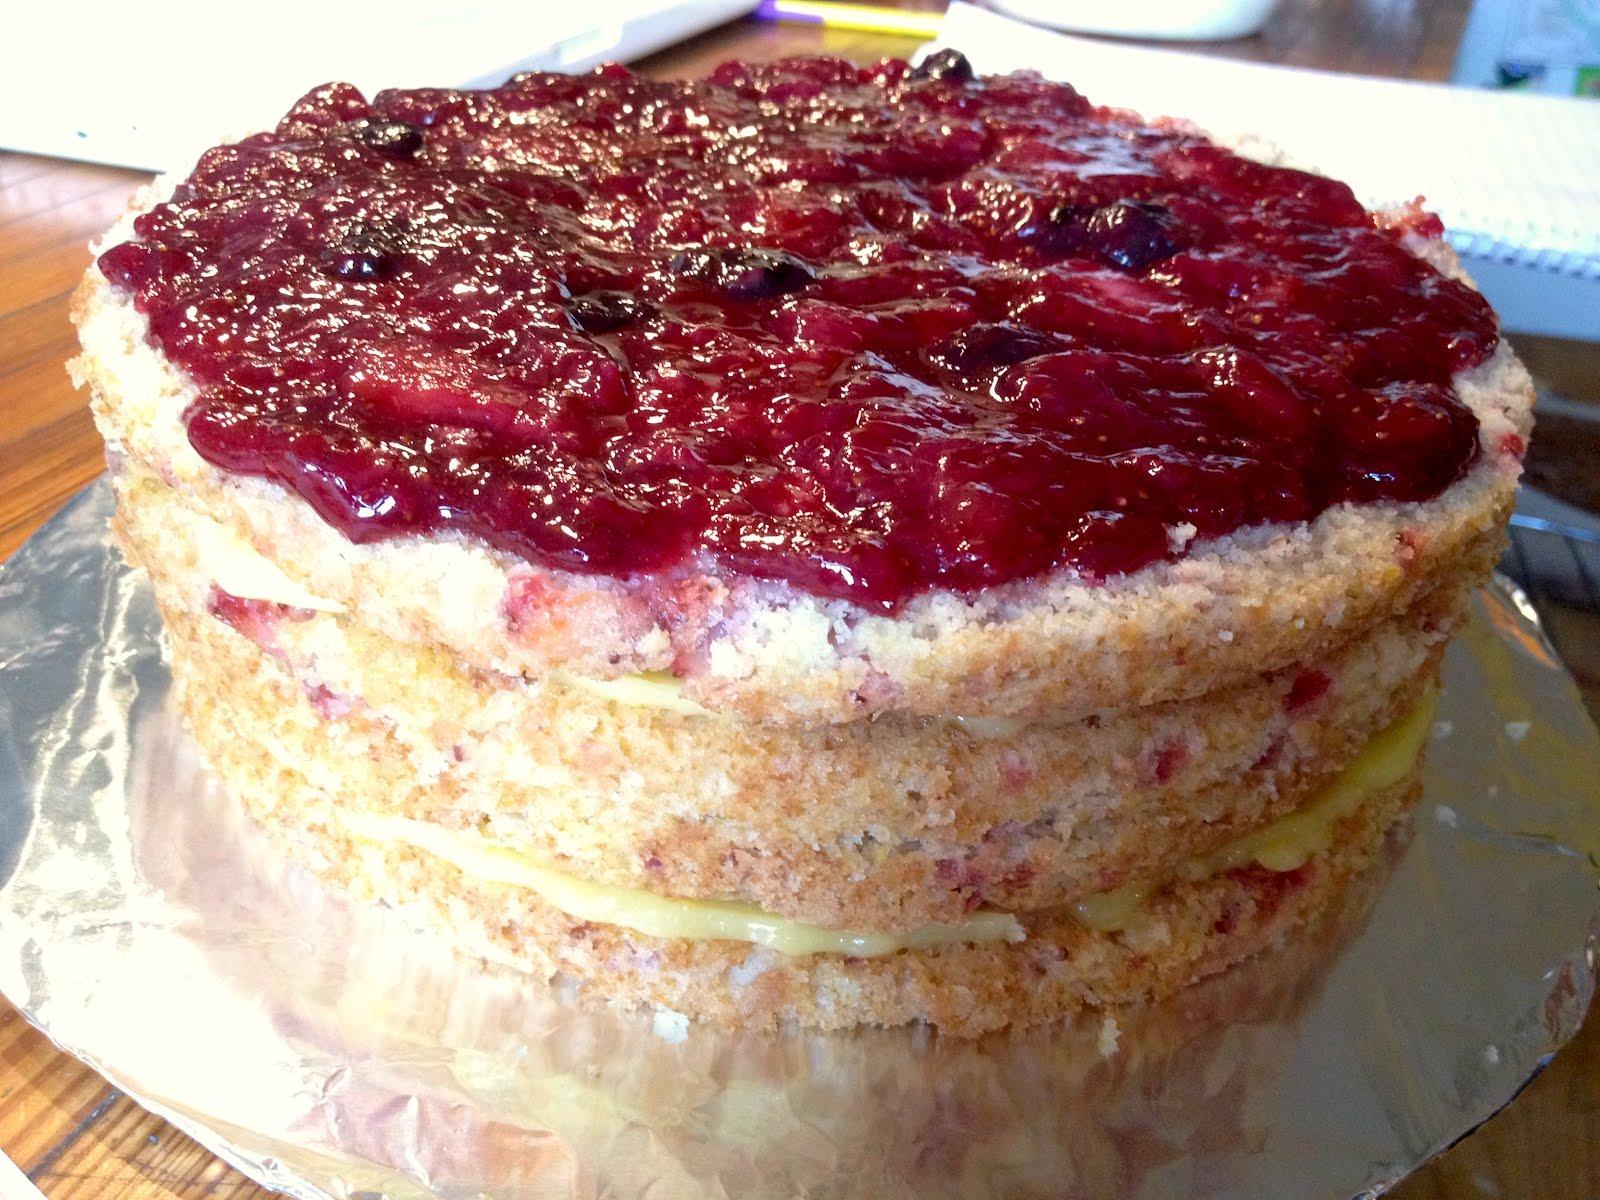 Disgruntled Baker: Strawberry Cake With Jam And Lemon Curd